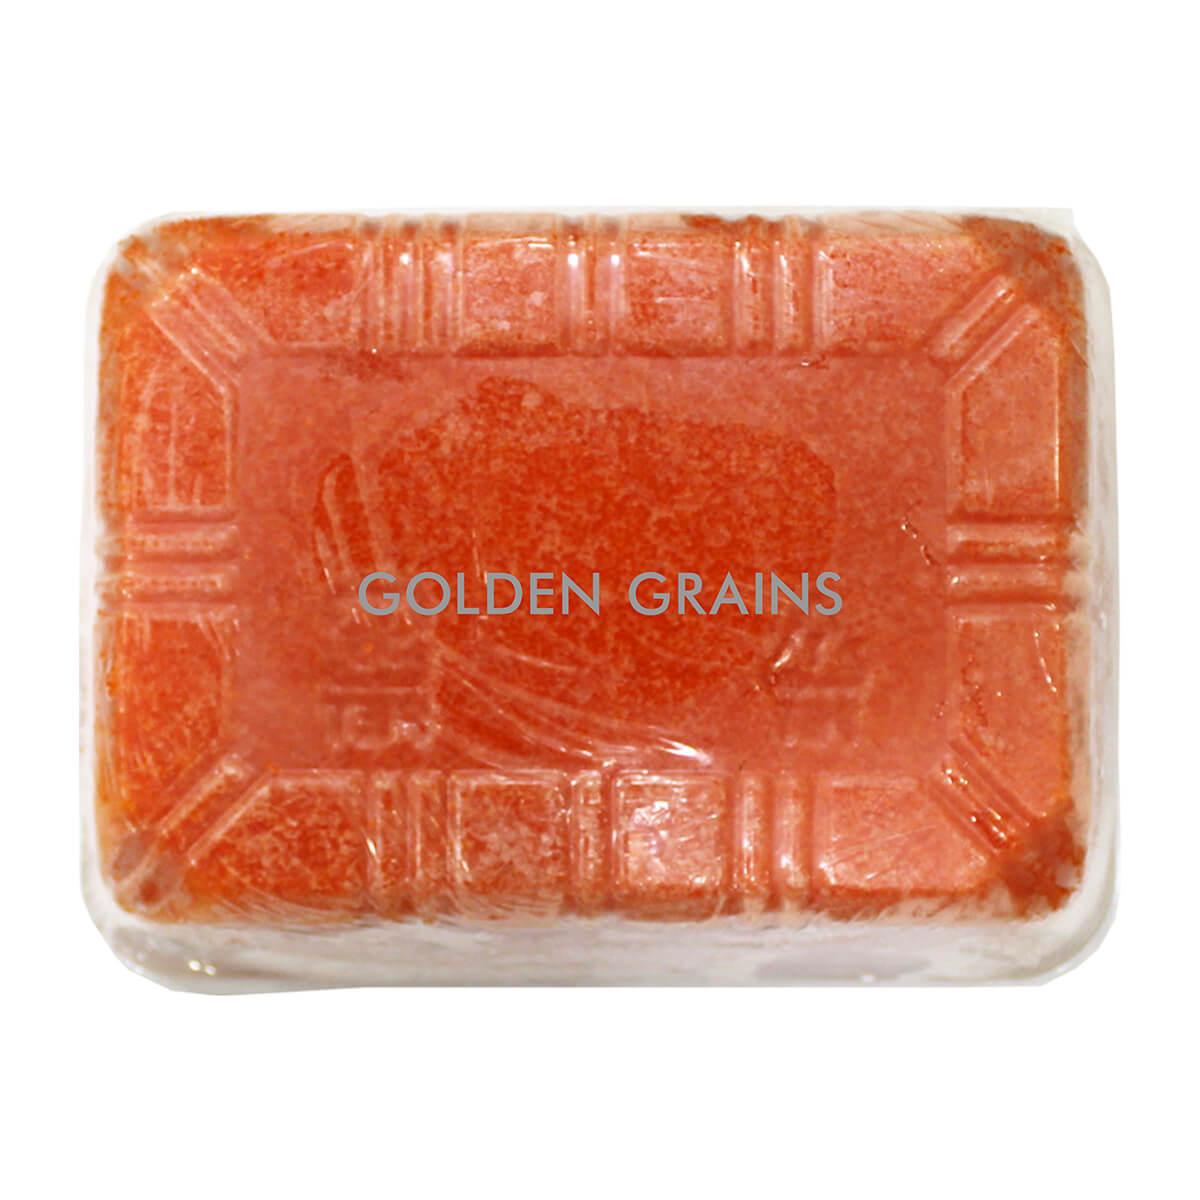 Golden Grains GGFT Masago - Orange - Back.jpg